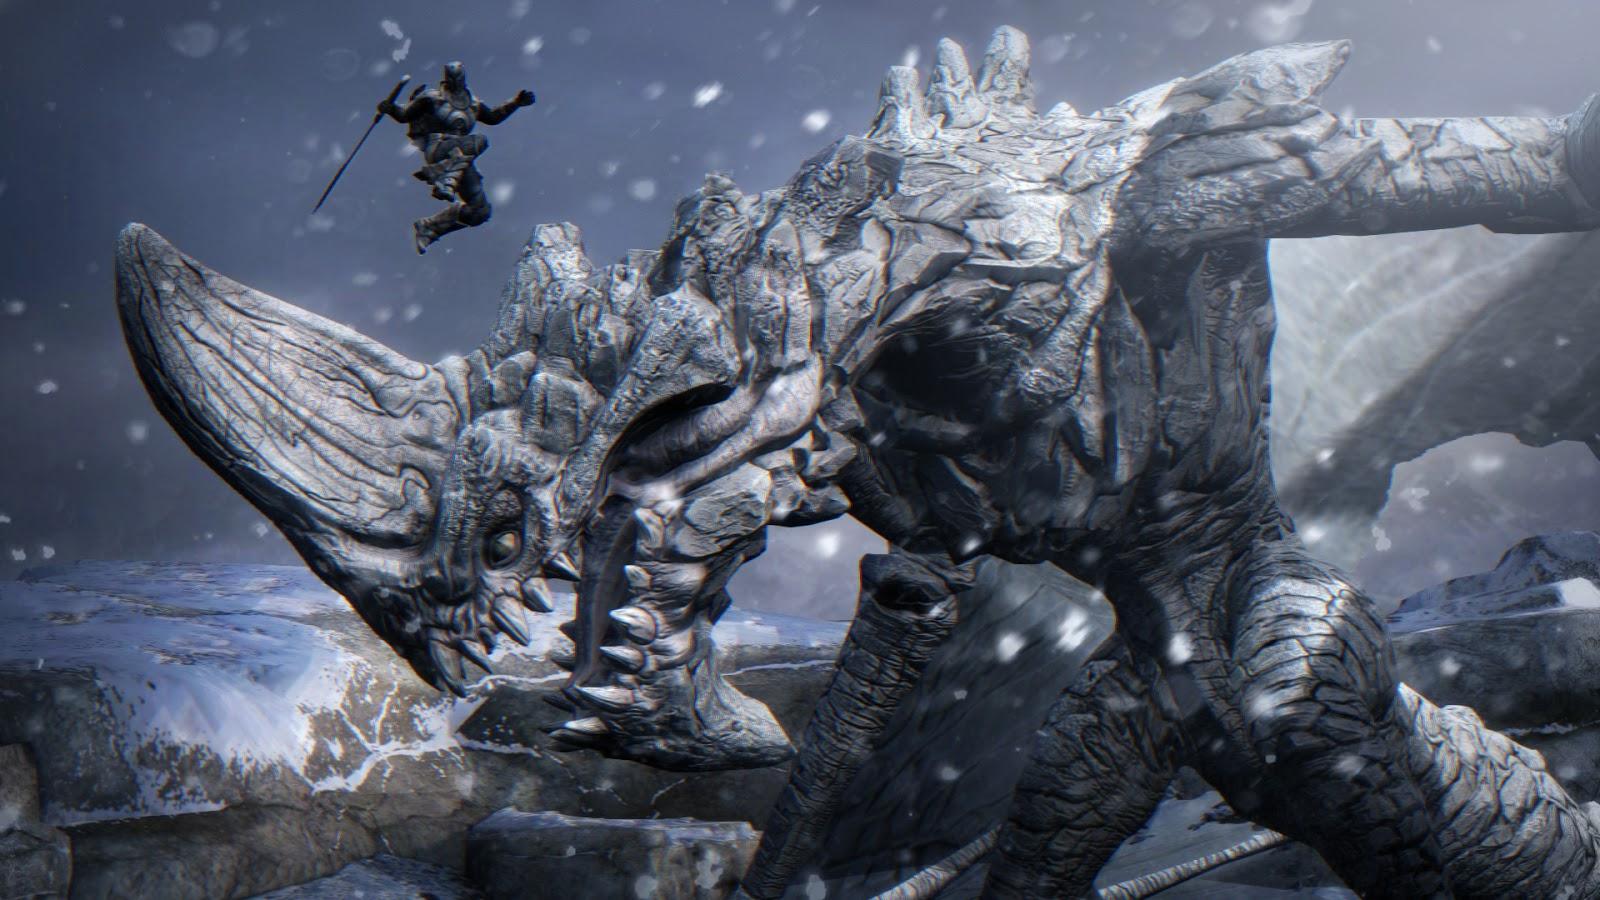 Explore The World Game : Infinity Blade III: Reborn - Game